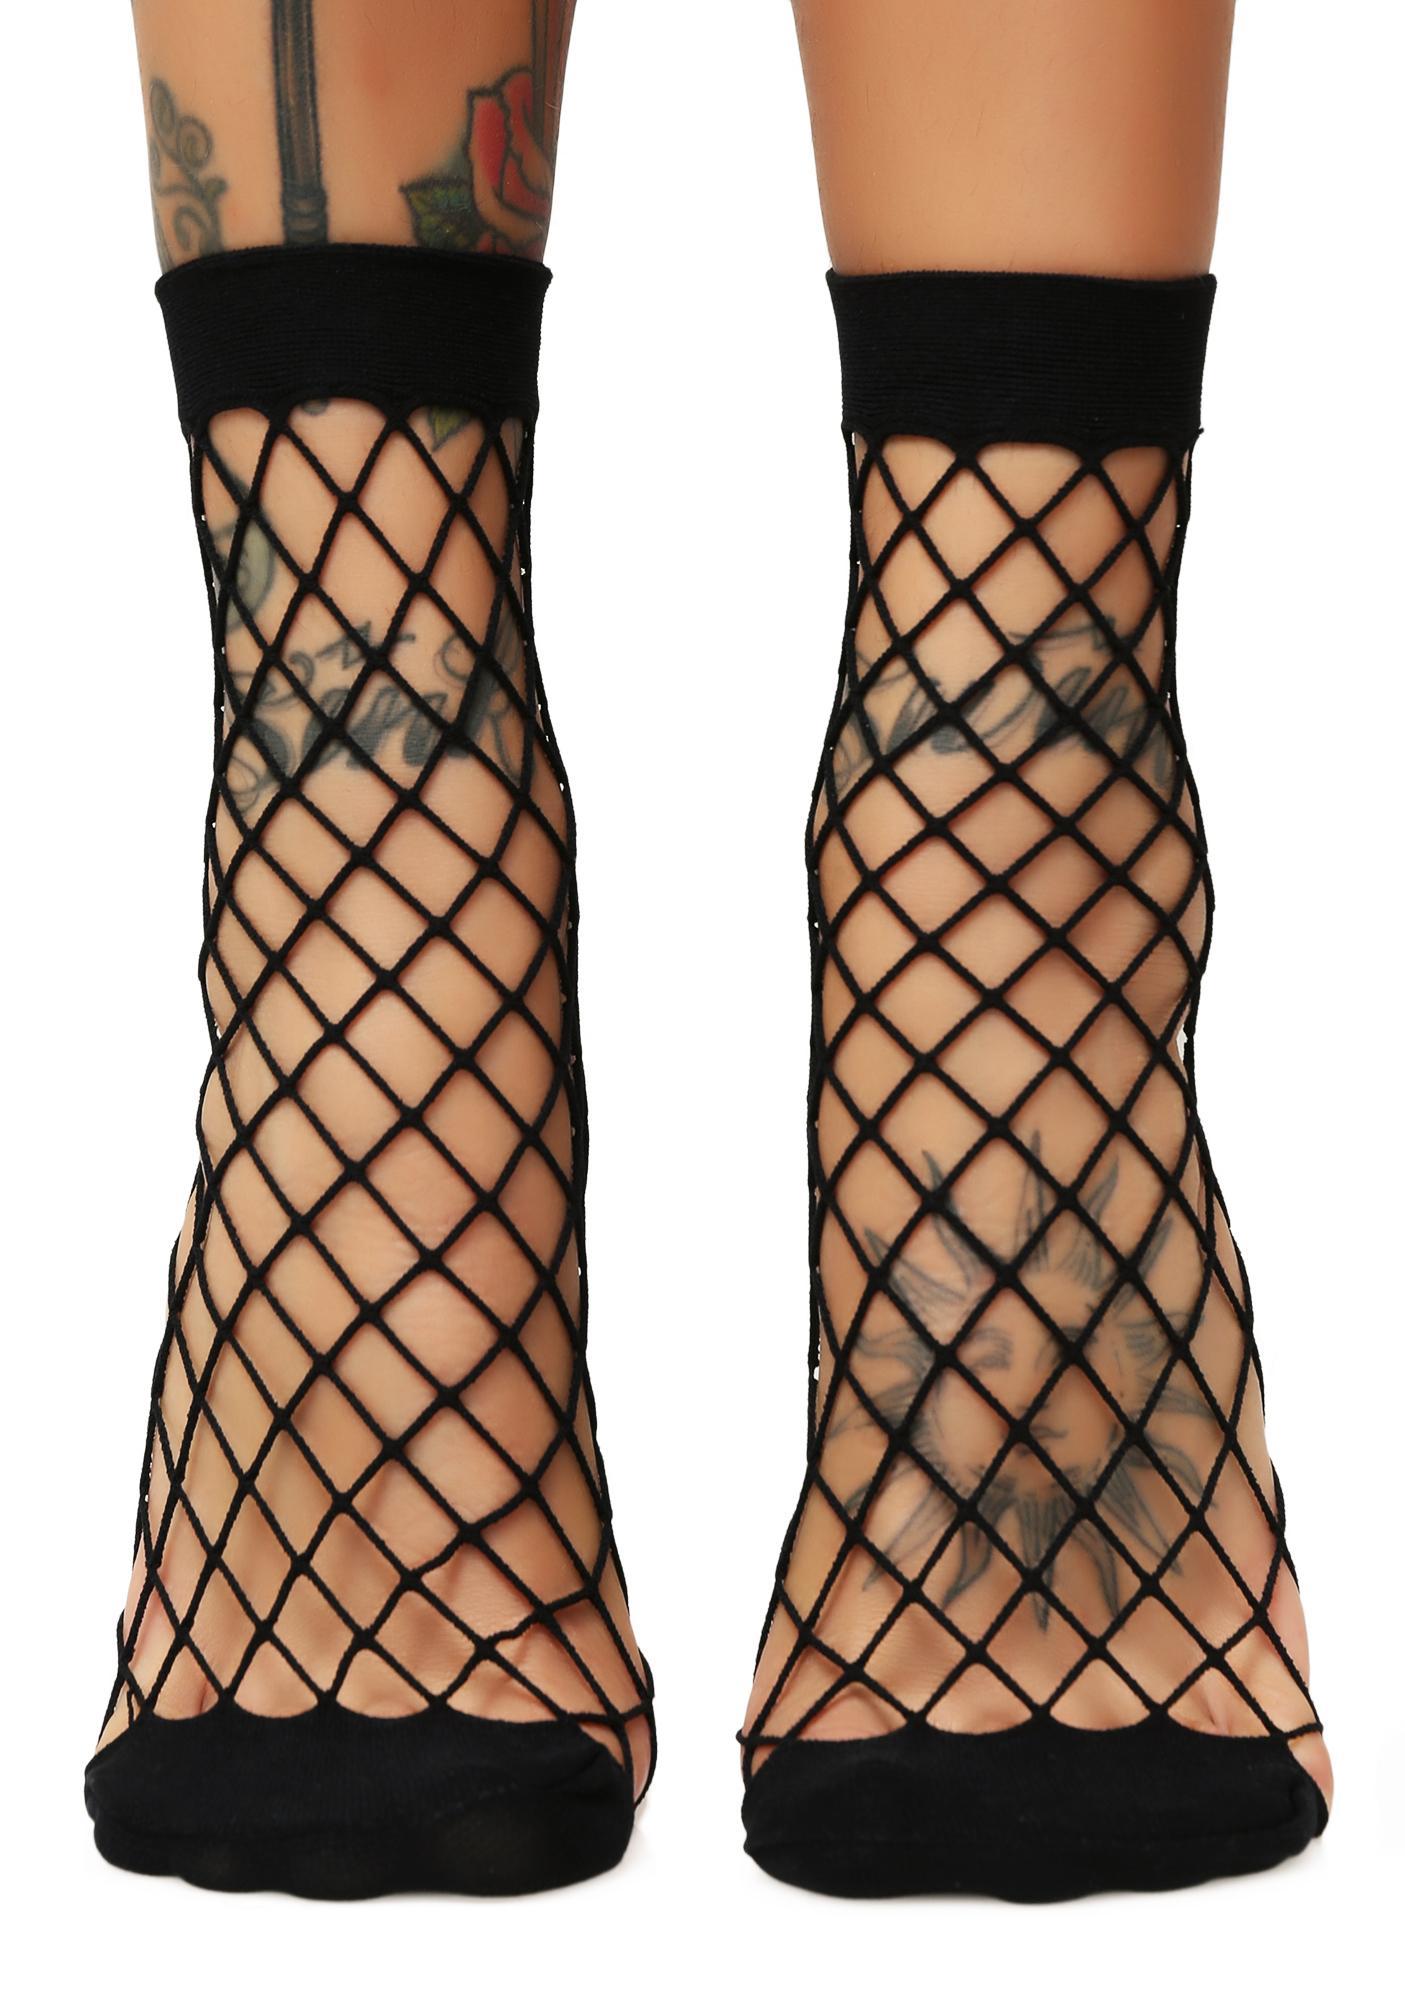 Evil Troublemaker Fishnet Socks